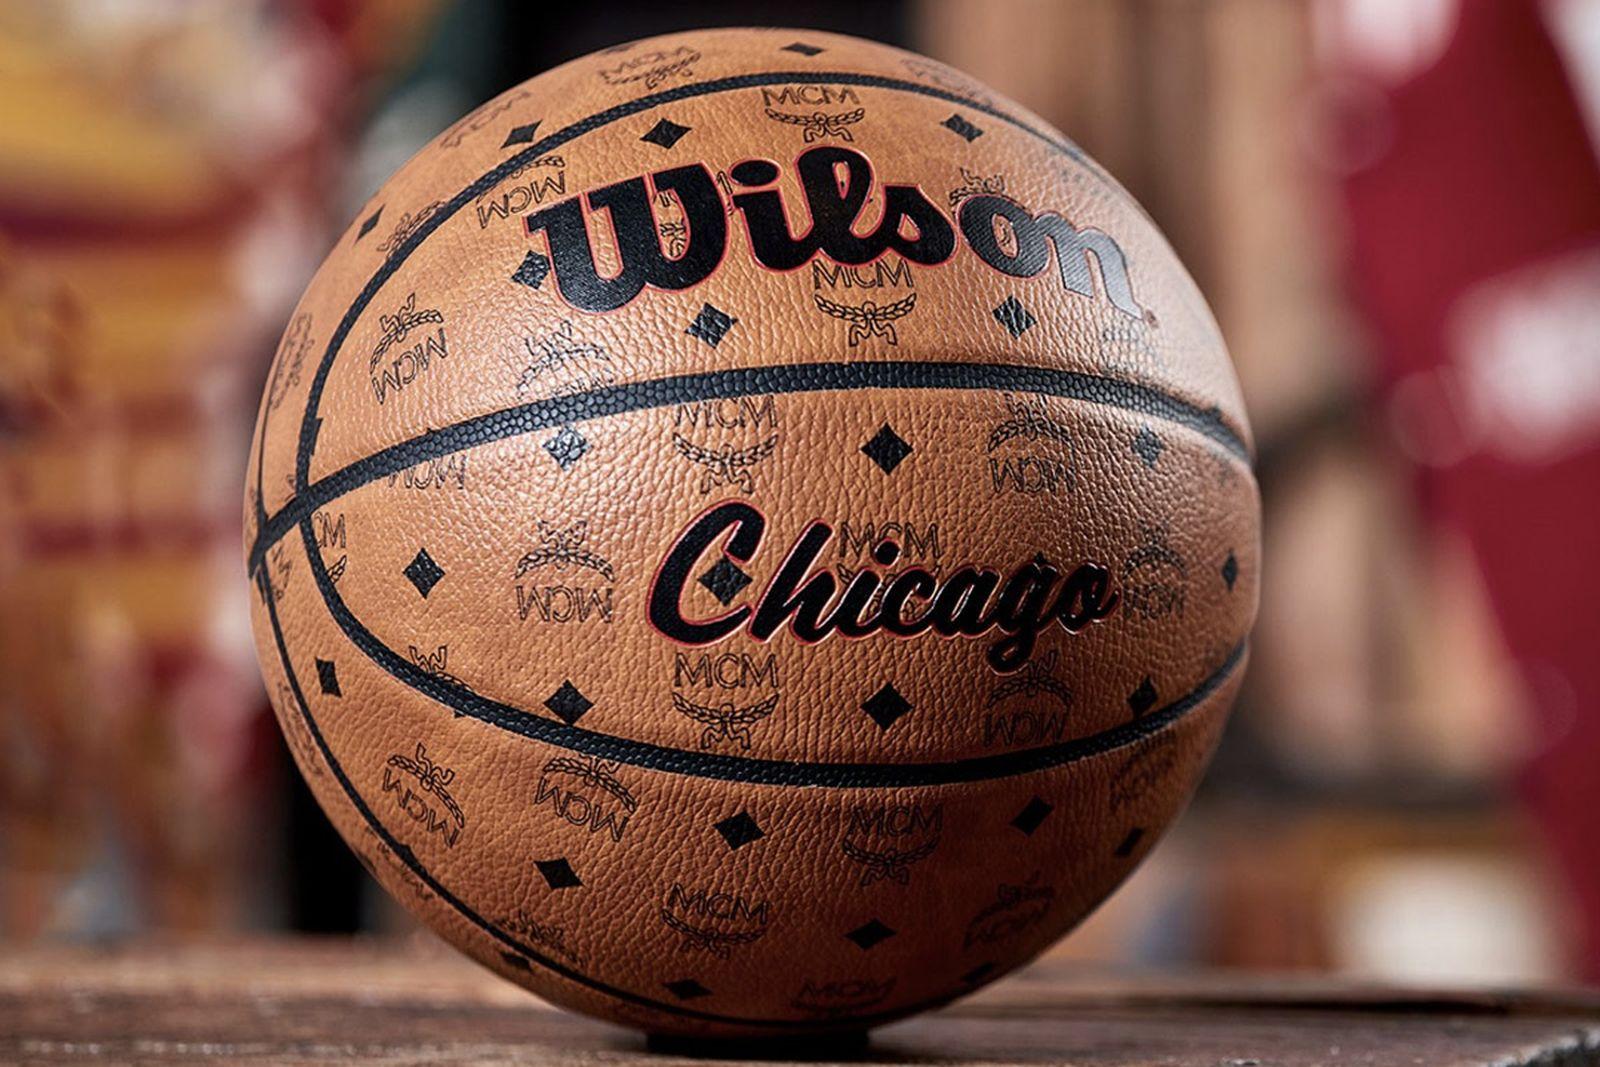 mcm-wilson-nba-star-weekend-chicago-basketball-01